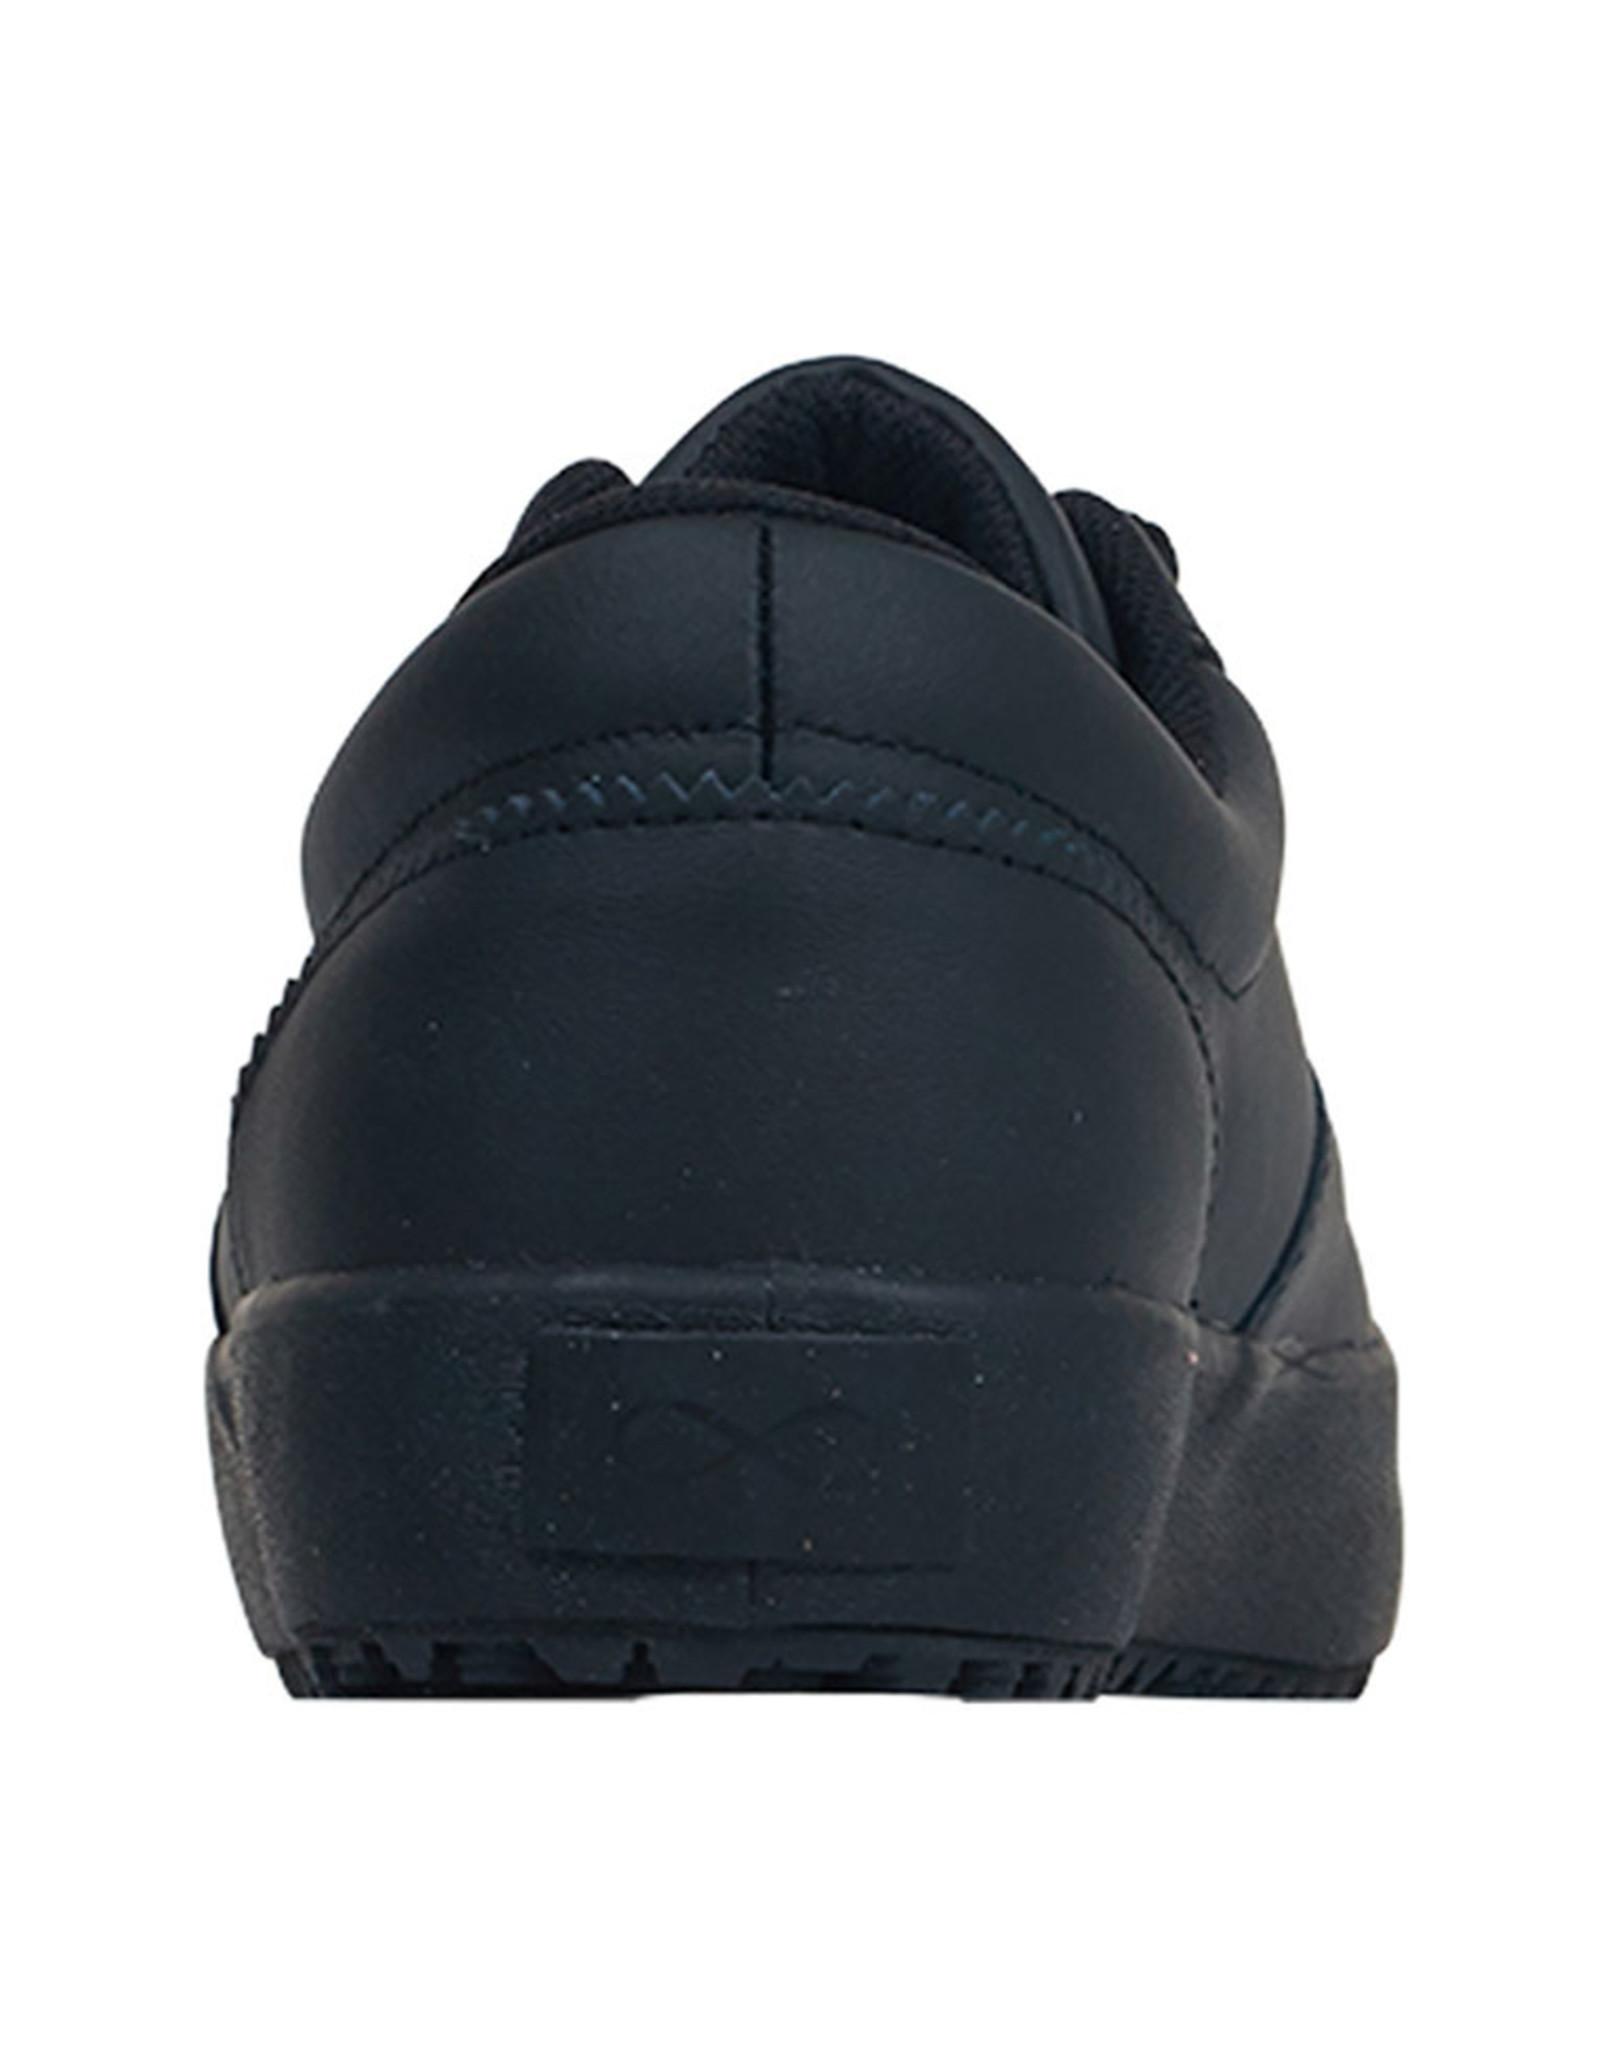 Cherokee Infinity Infinity Footwear Pace - Infinity Pace Shoe